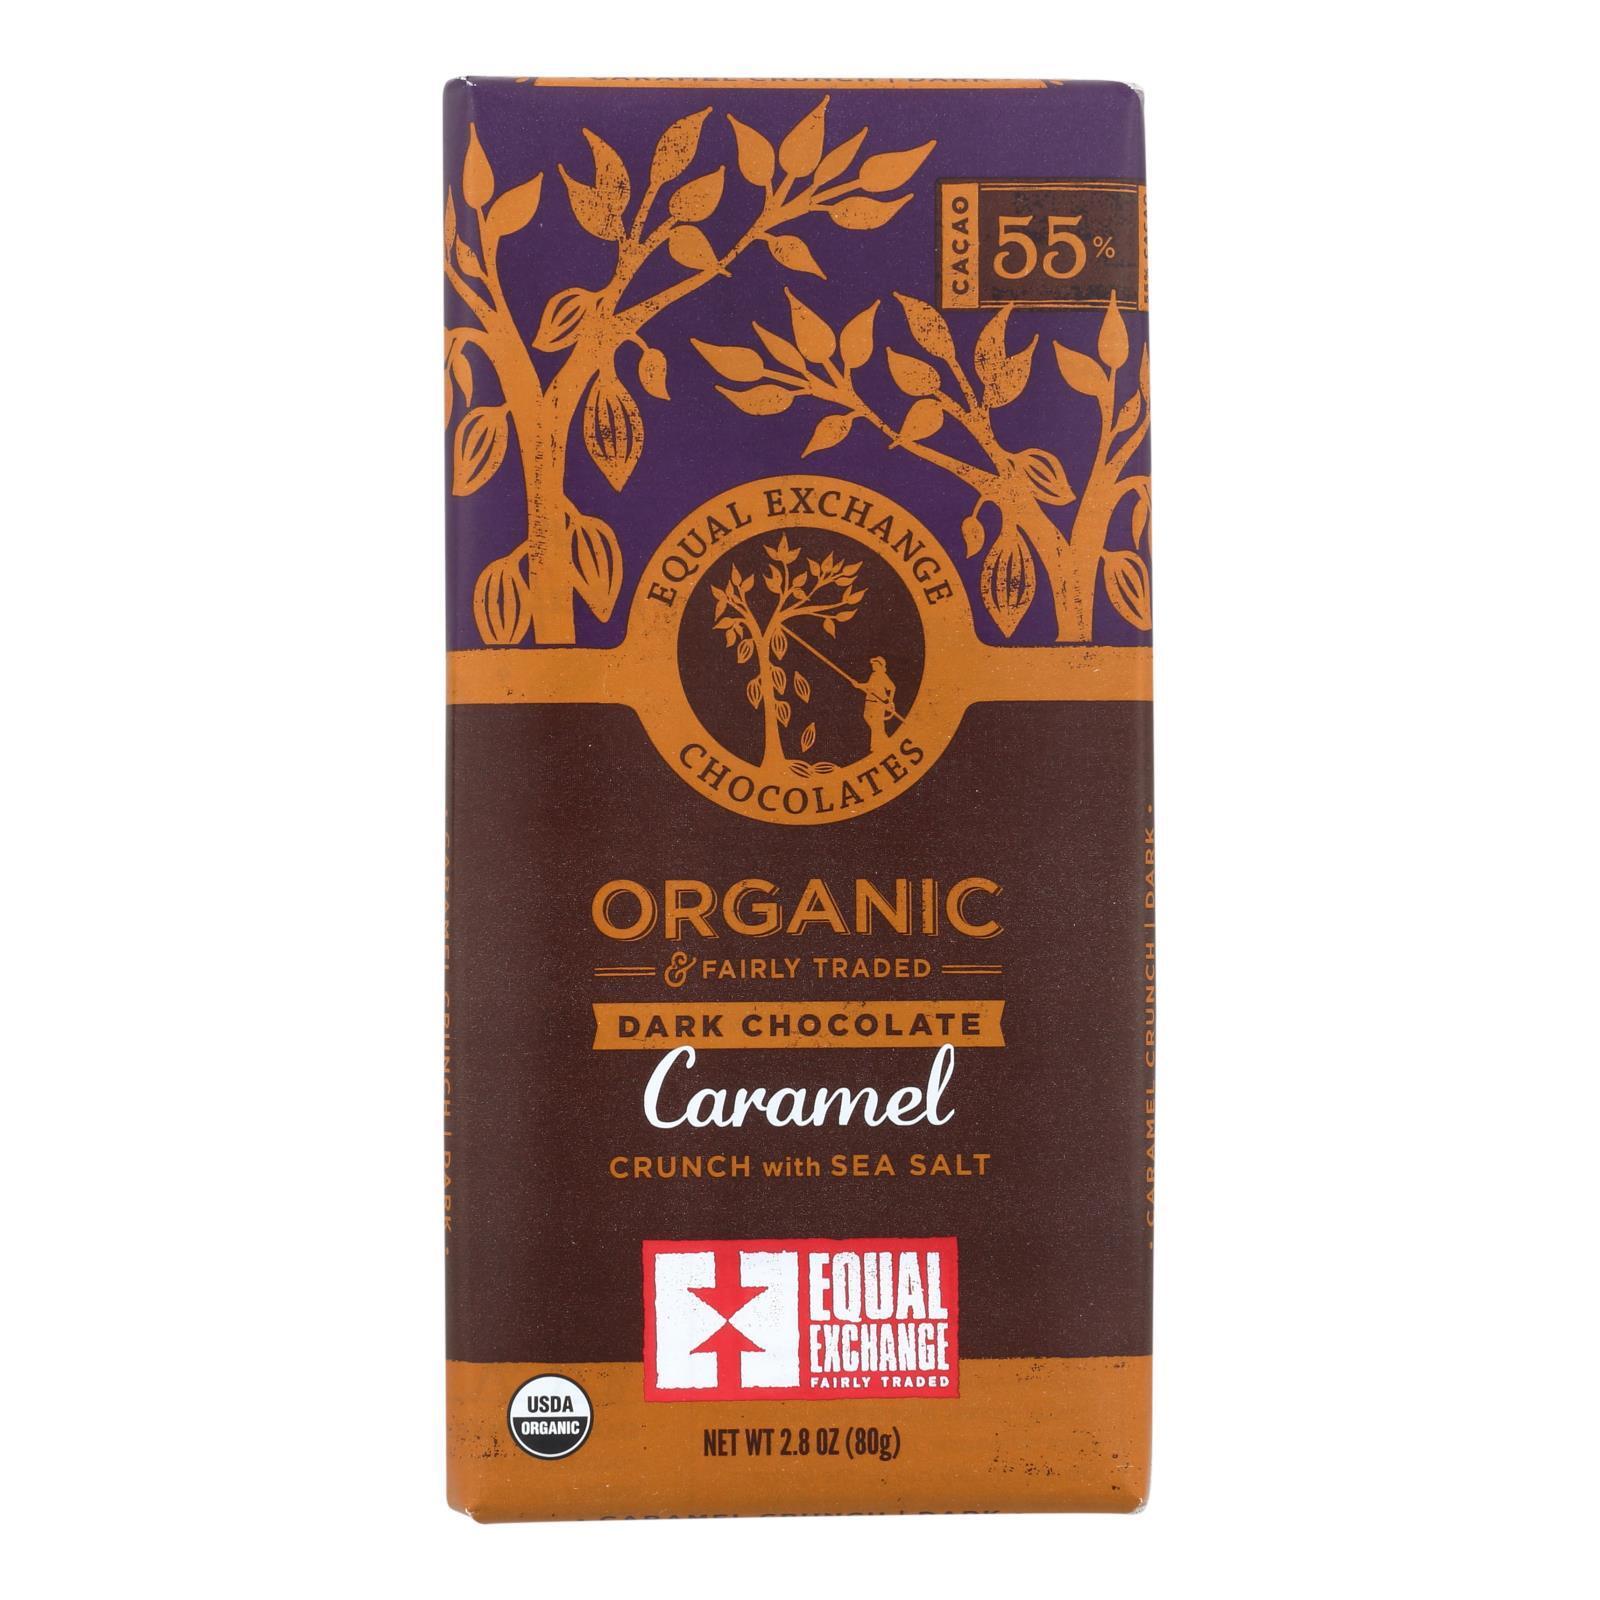 Equal Exchange Organic Milk Chocolate Bar - Caramel Crunch with Sea Salt - Case of 12 - 2.8 oz.